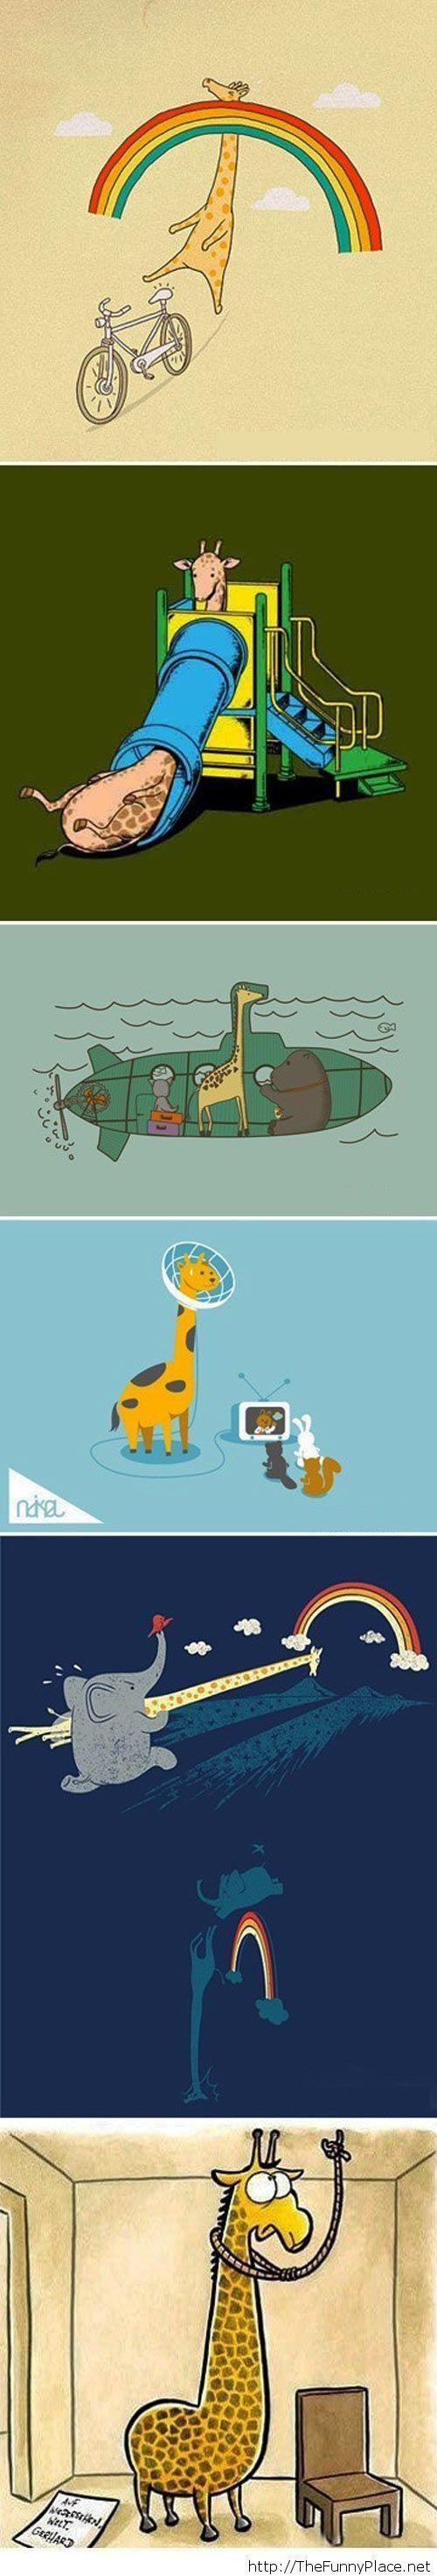 Giraffe's problems